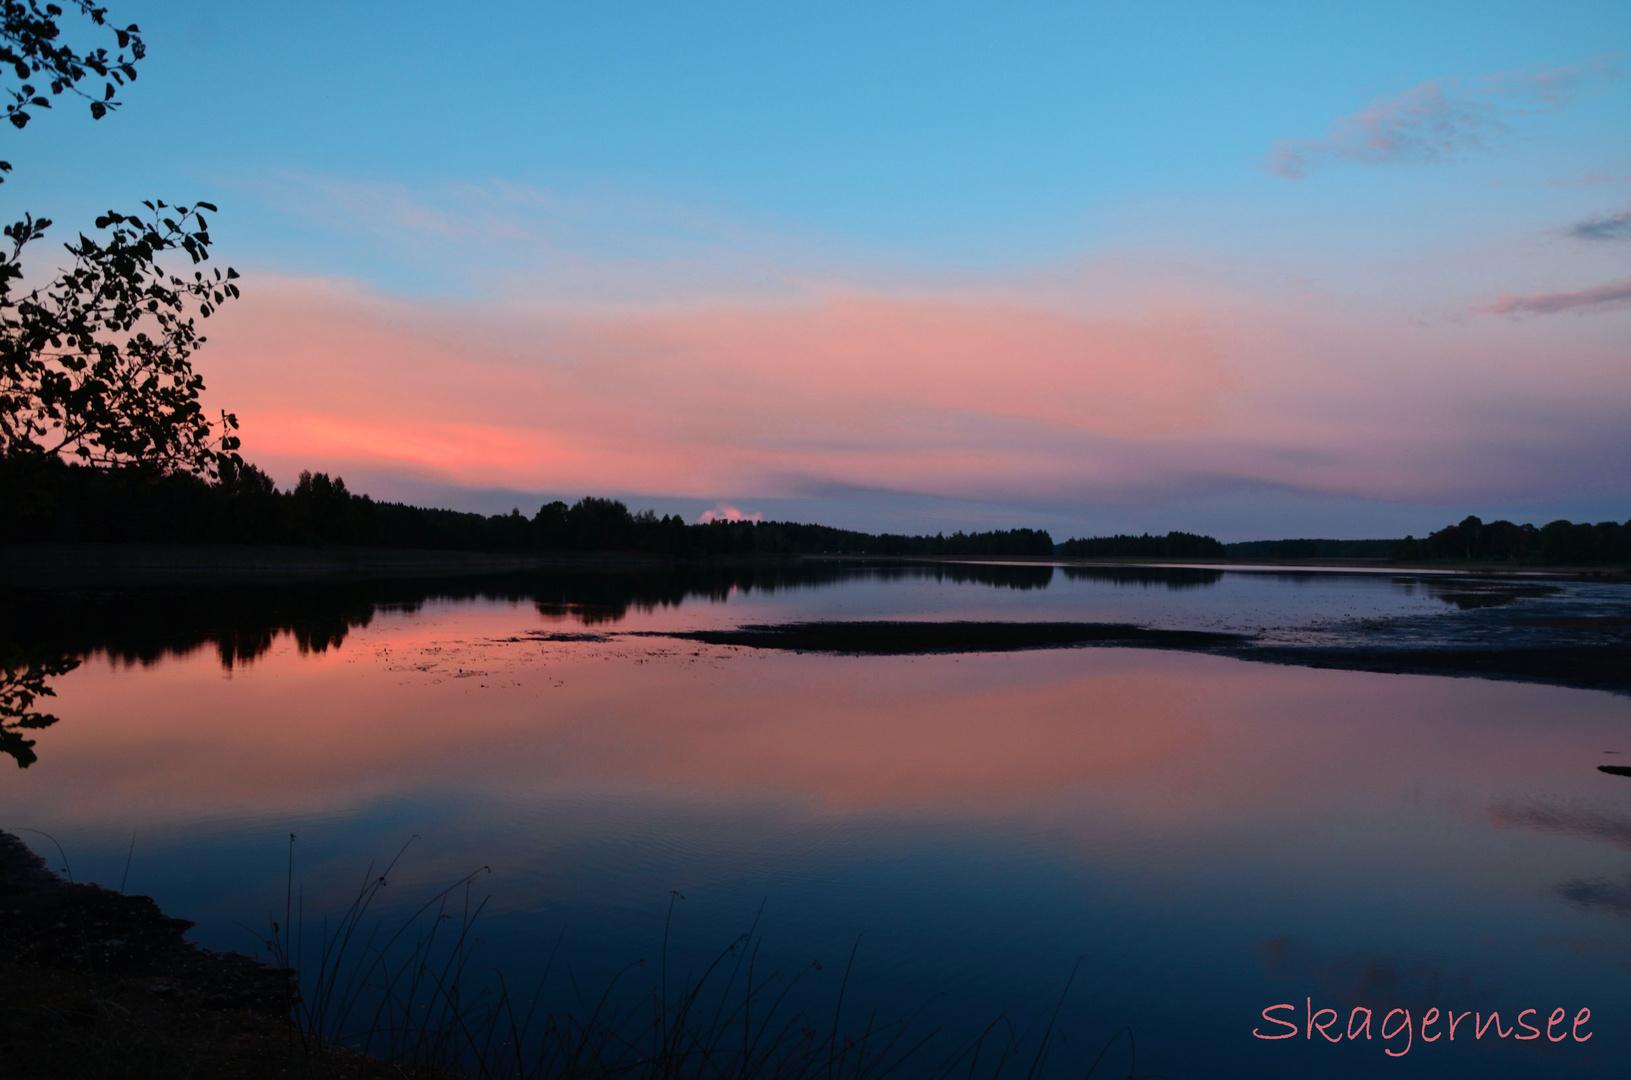 Sonnenuntergang am Skagernsee